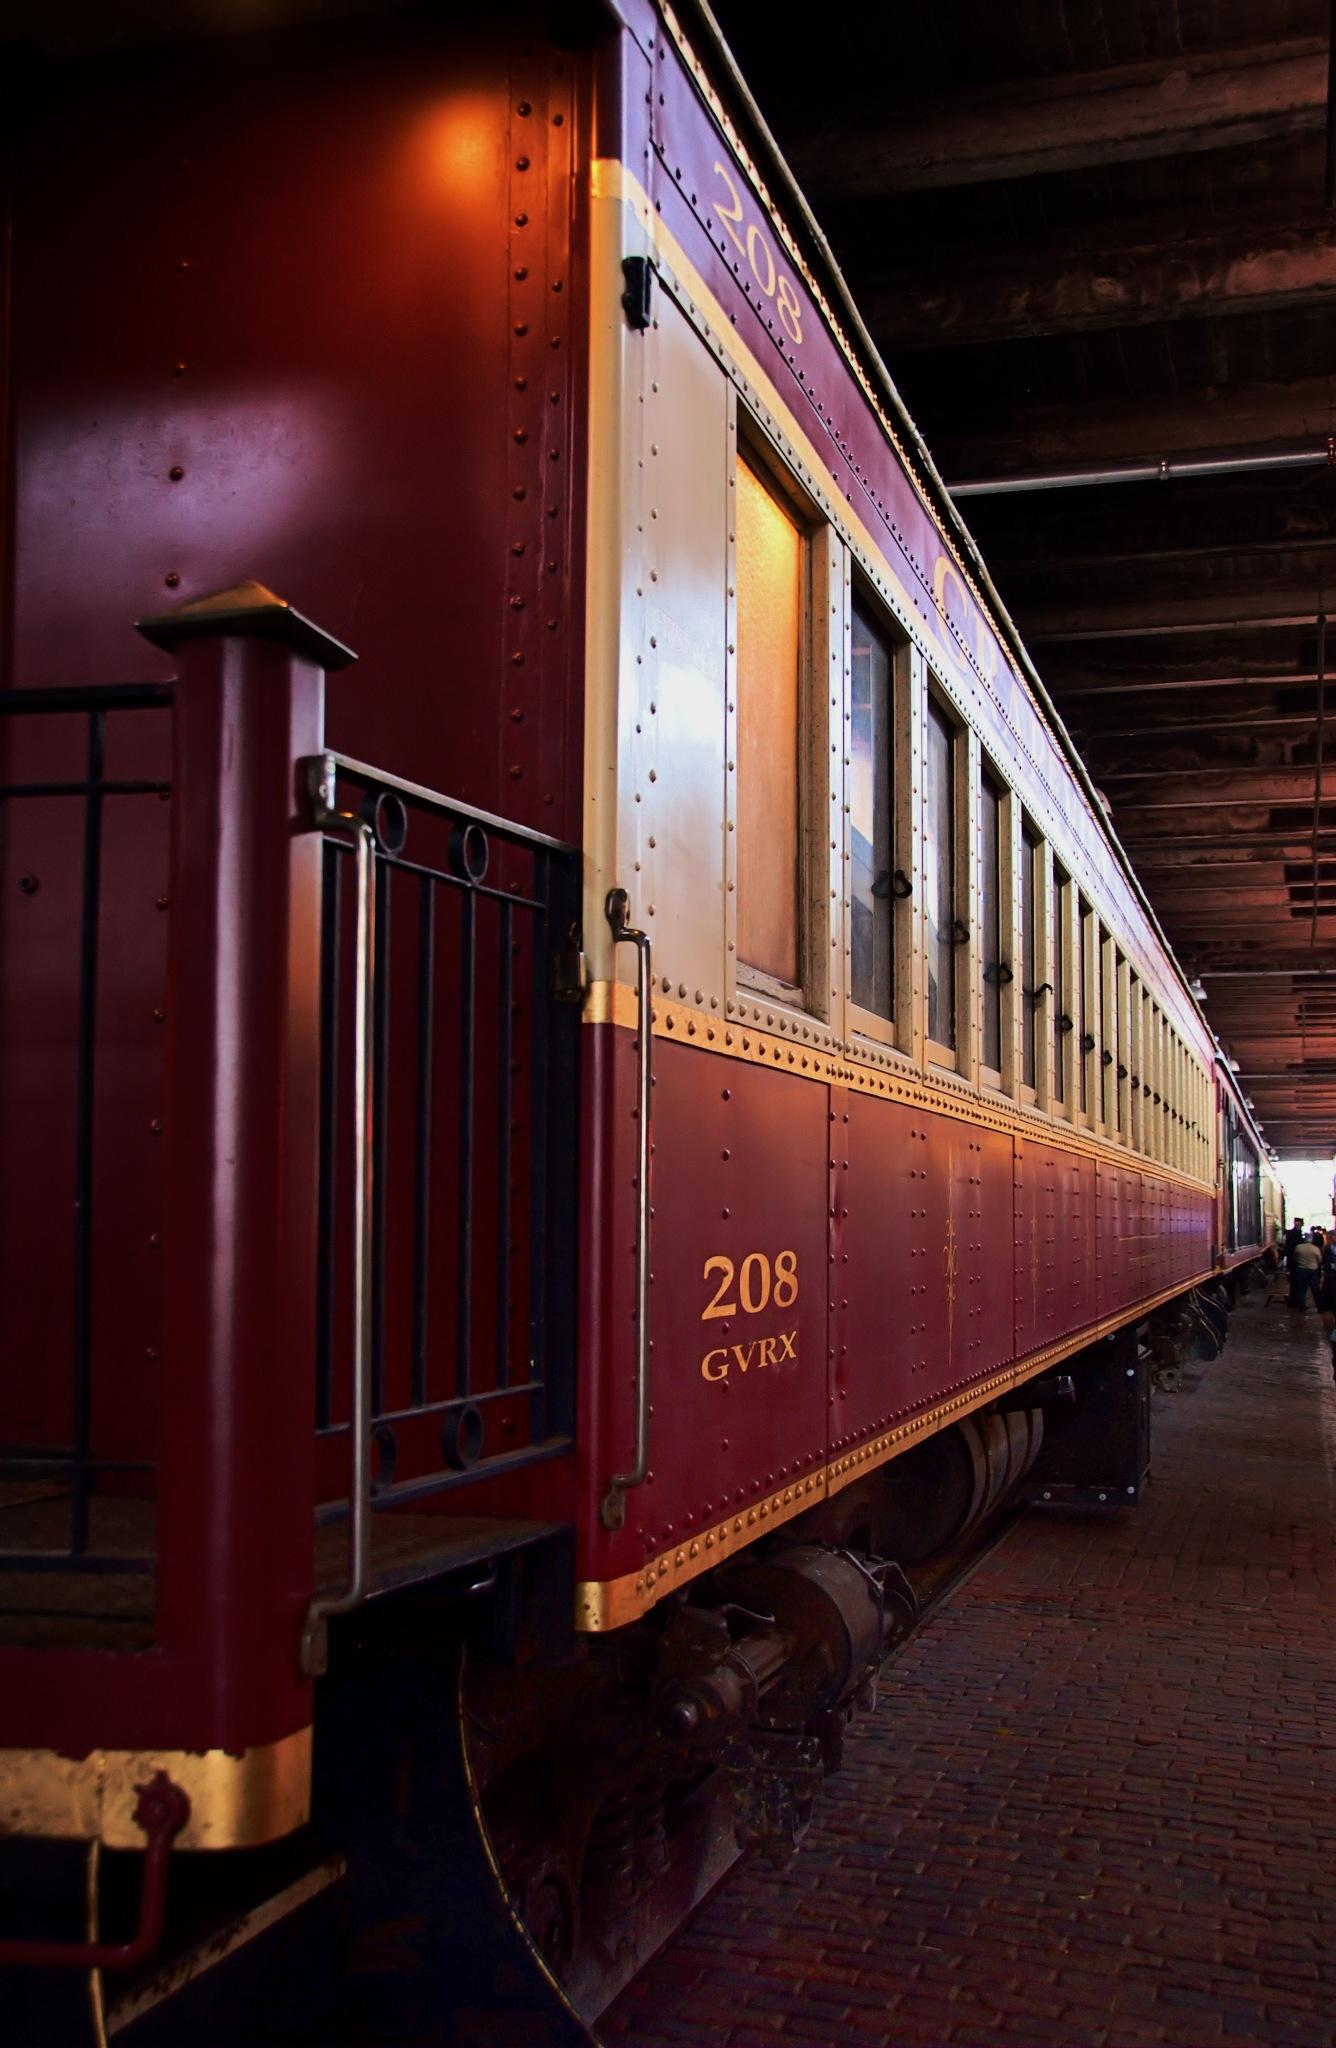 Tarantula Train - Fort Worth Texas Stockyards by jphall